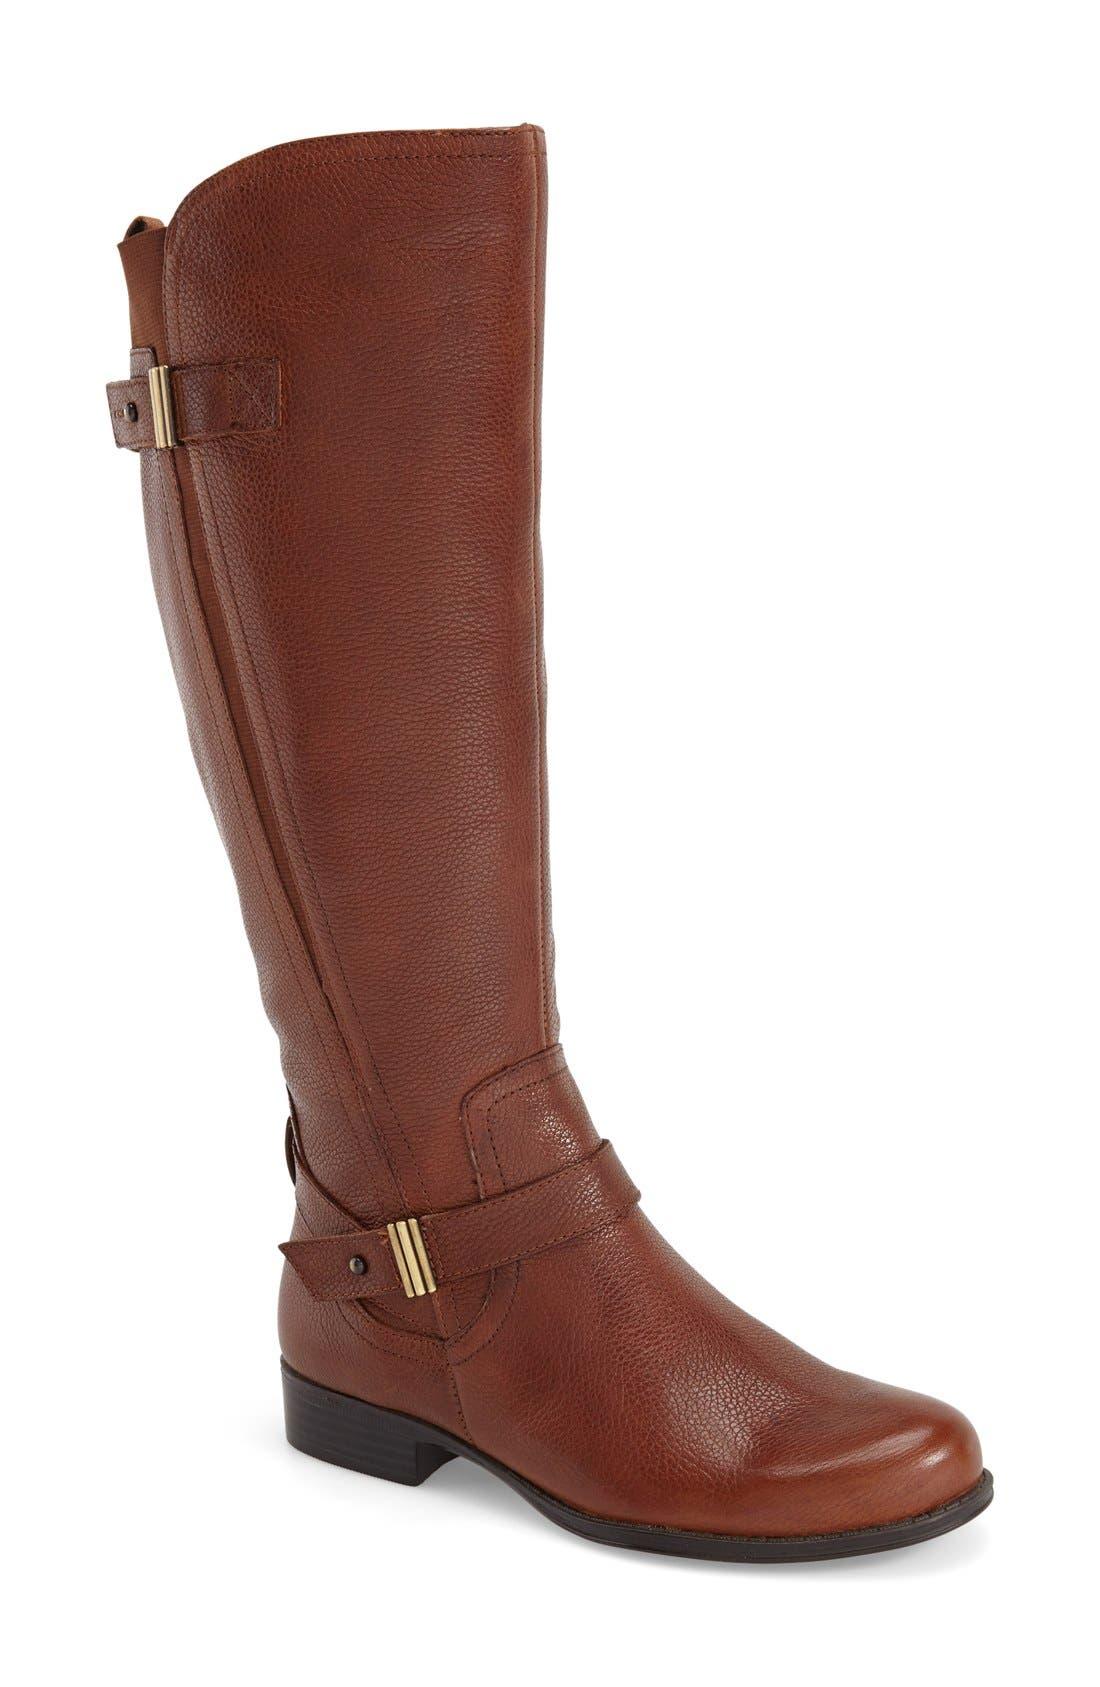 Alternate Image 1 Selected - Naturalizer 'Joan' Riding Boot (Women) (Wide Calf)